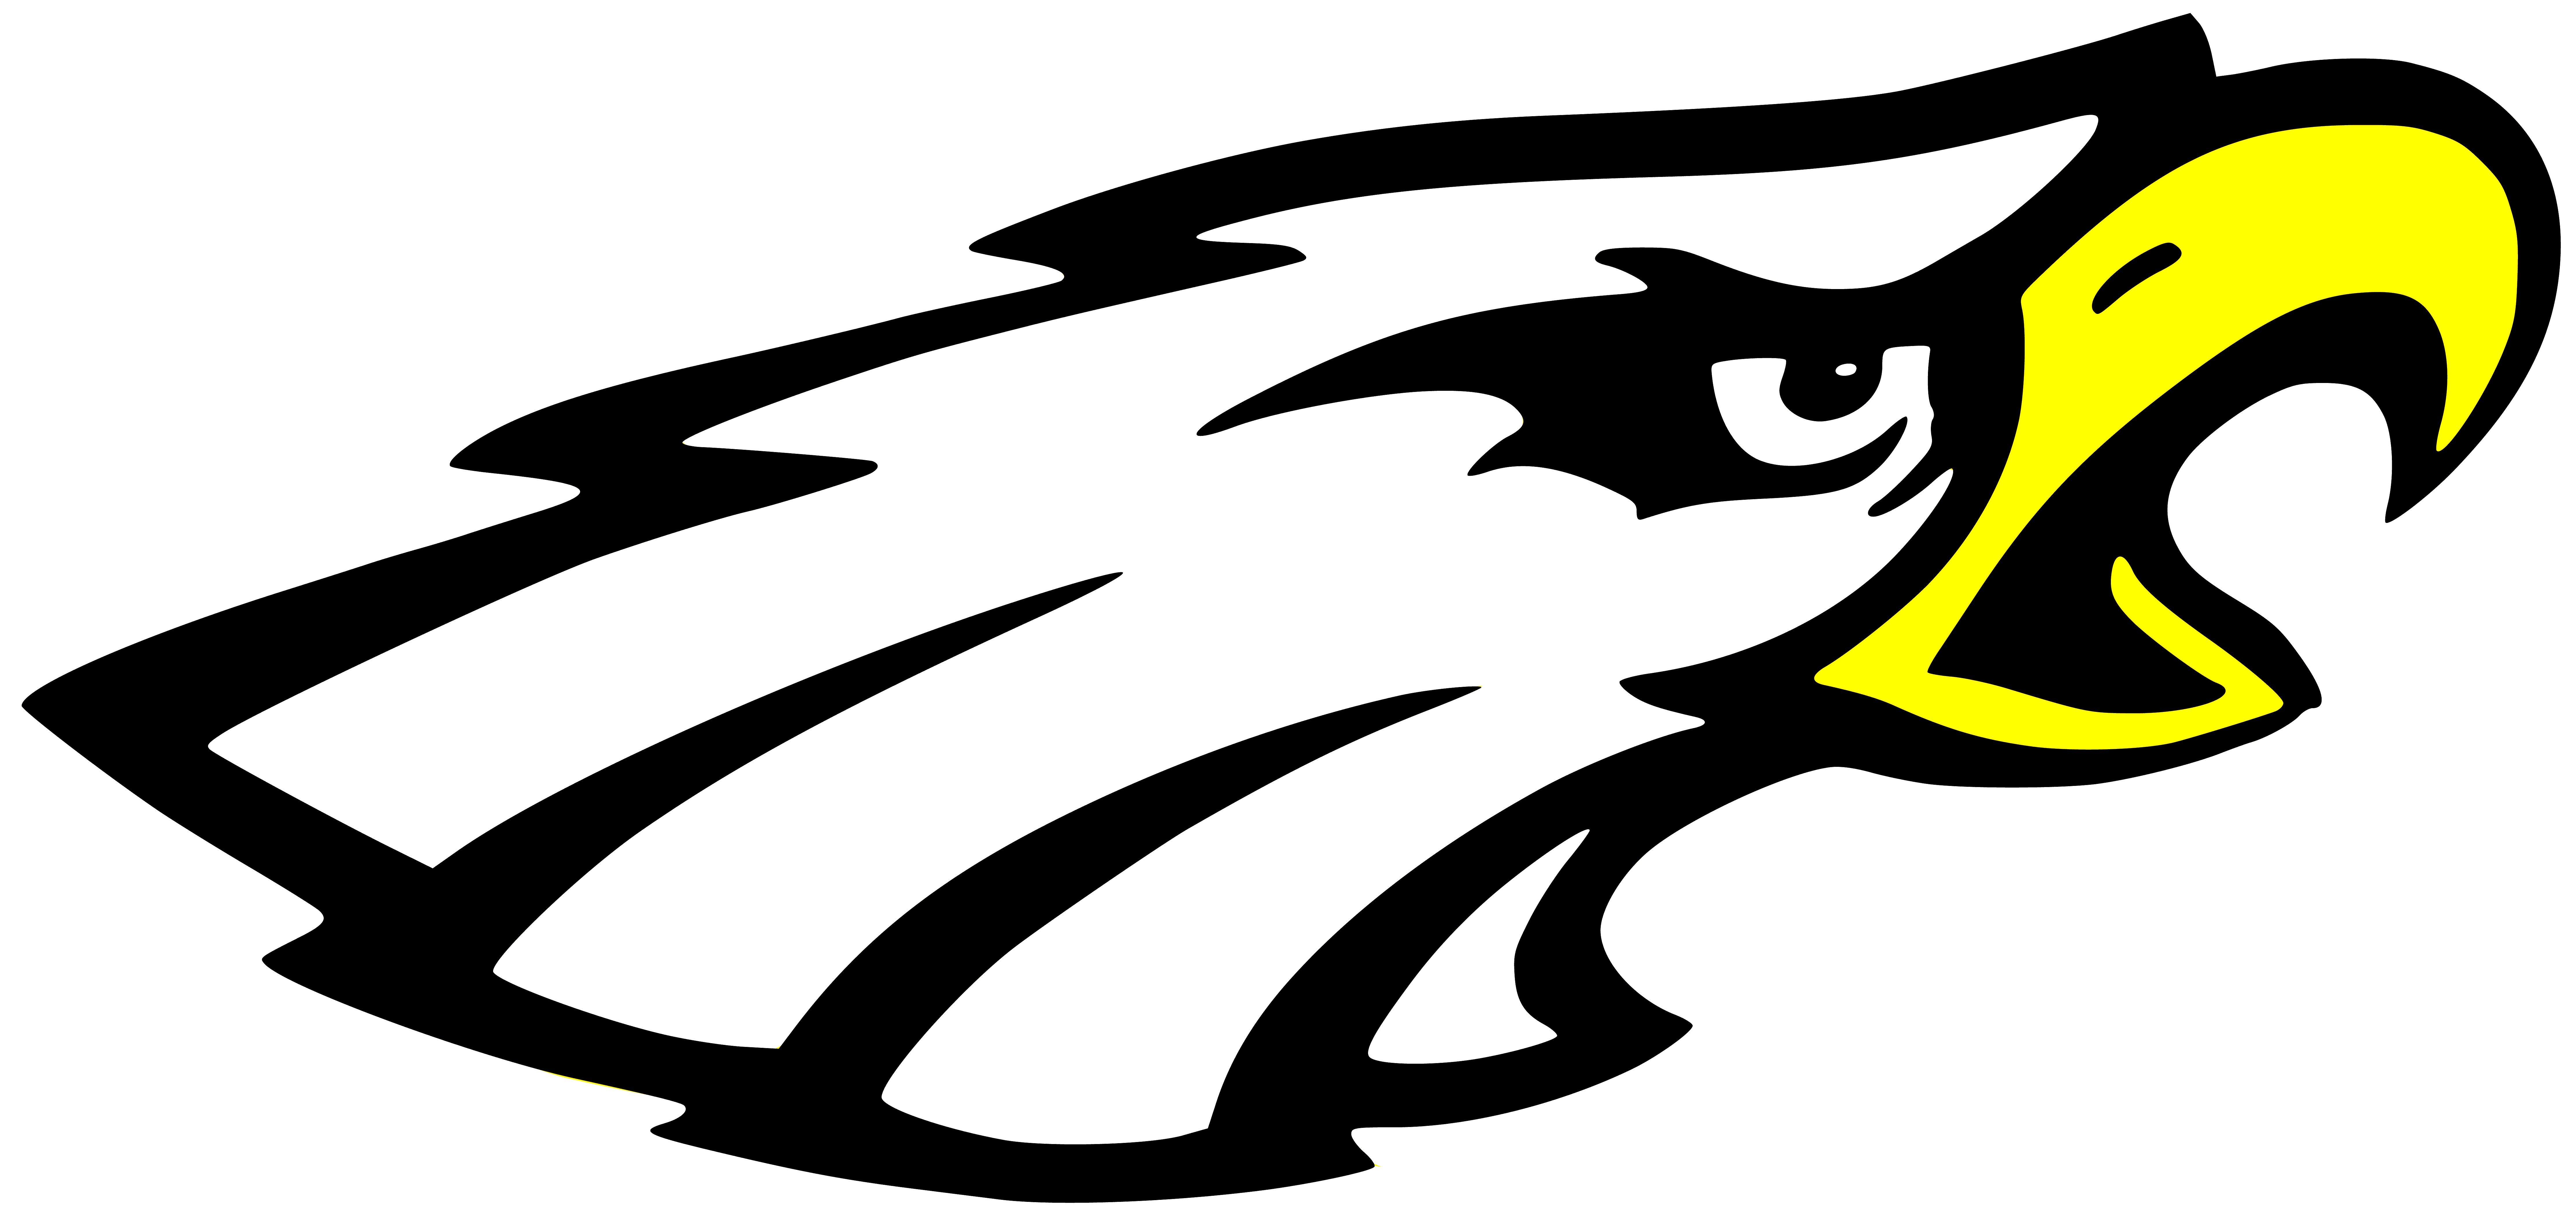 Eagle basketball clipart banner royalty free library Big Walnut - Team Home Big Walnut Golden Eagles Sports banner royalty free library